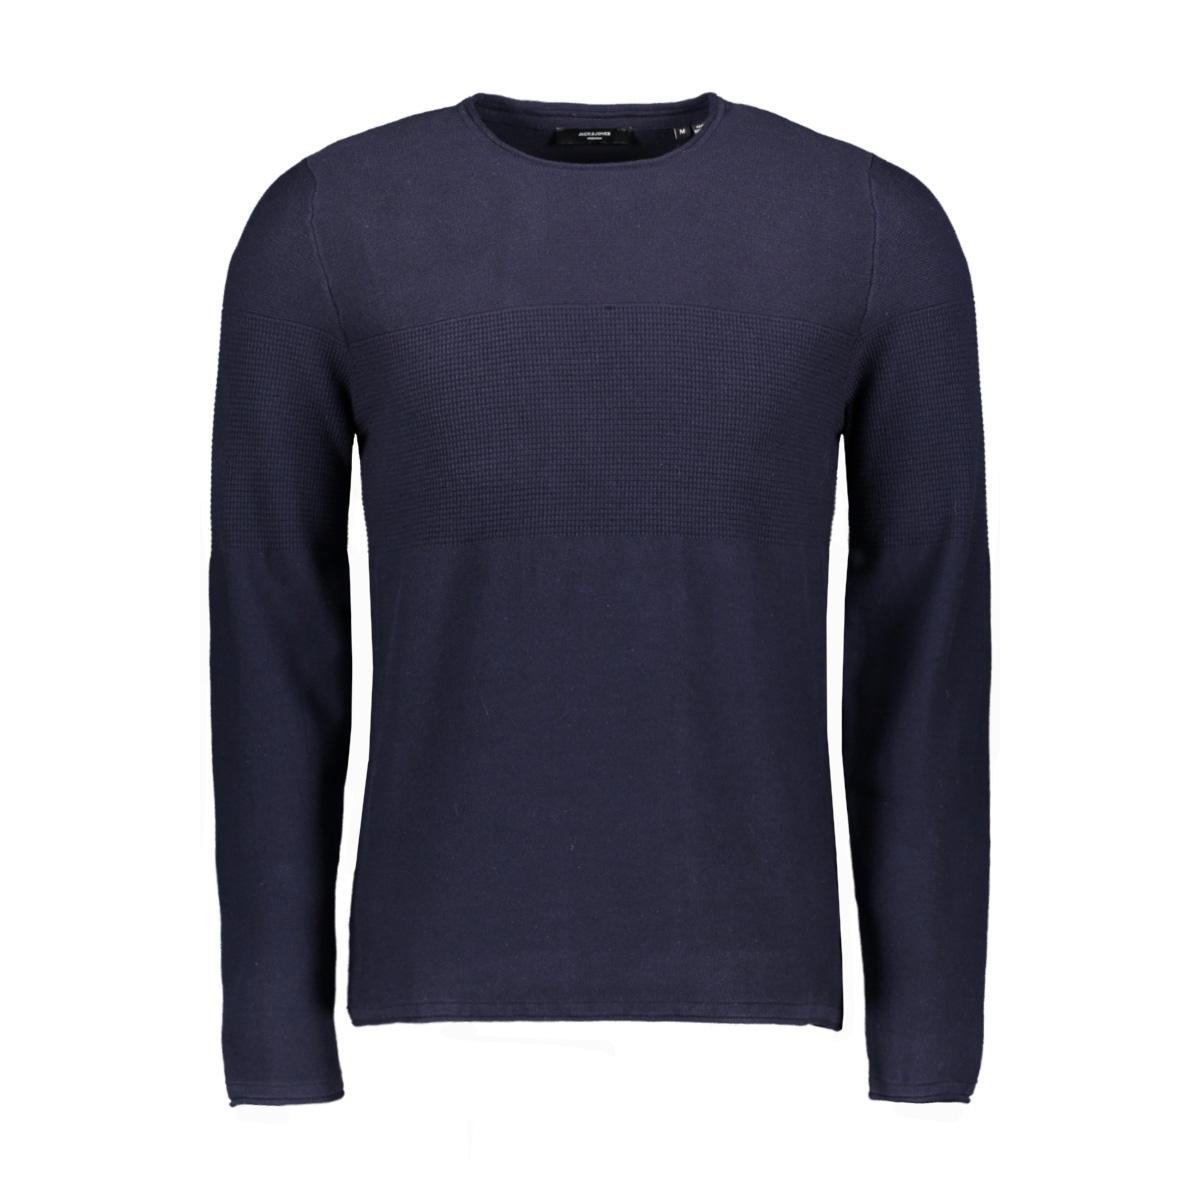 jprblamaximus knit crew organic 12168253 jack & jones trui martitime blue